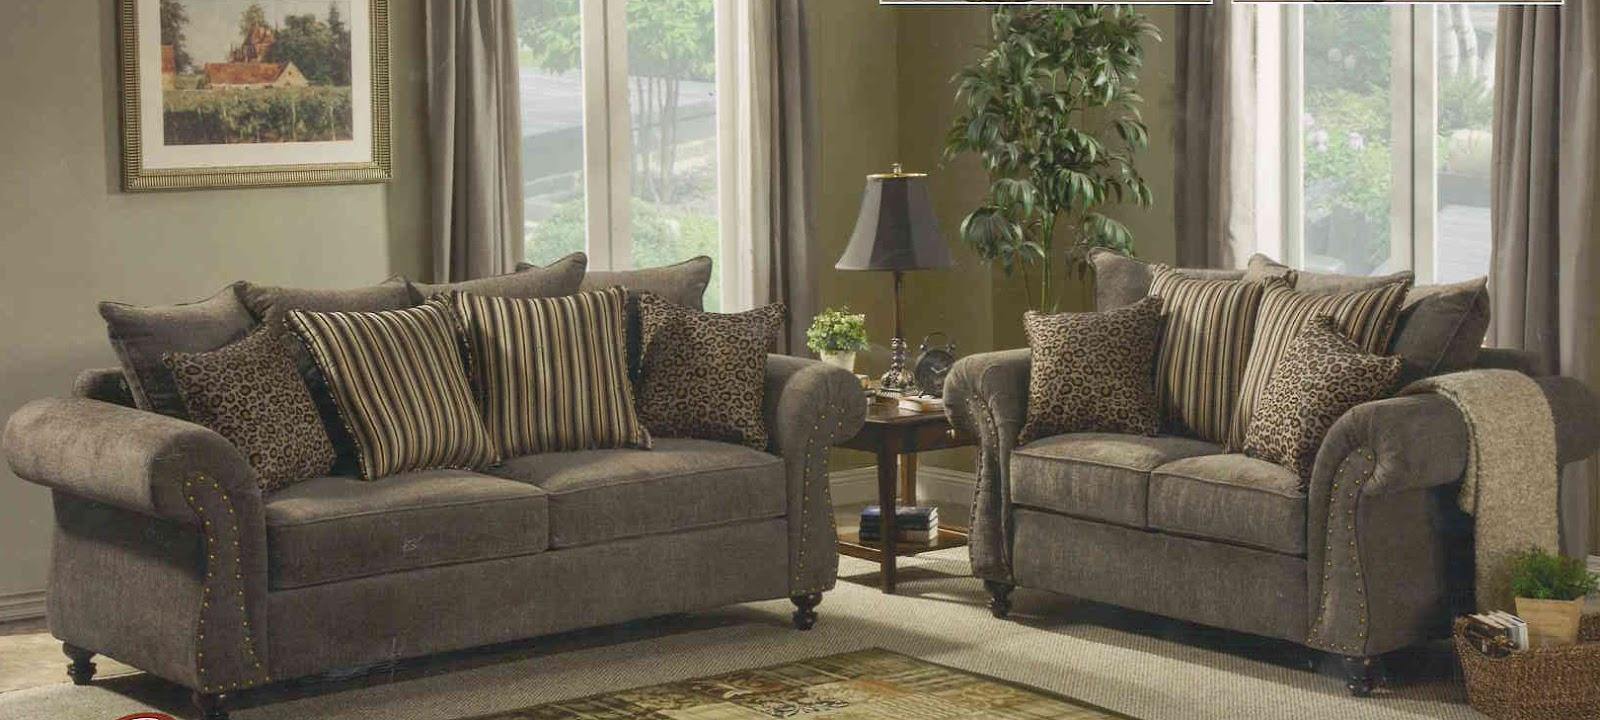 Charmant Desirable U0026 Reasonable Furniture In Riverside CA